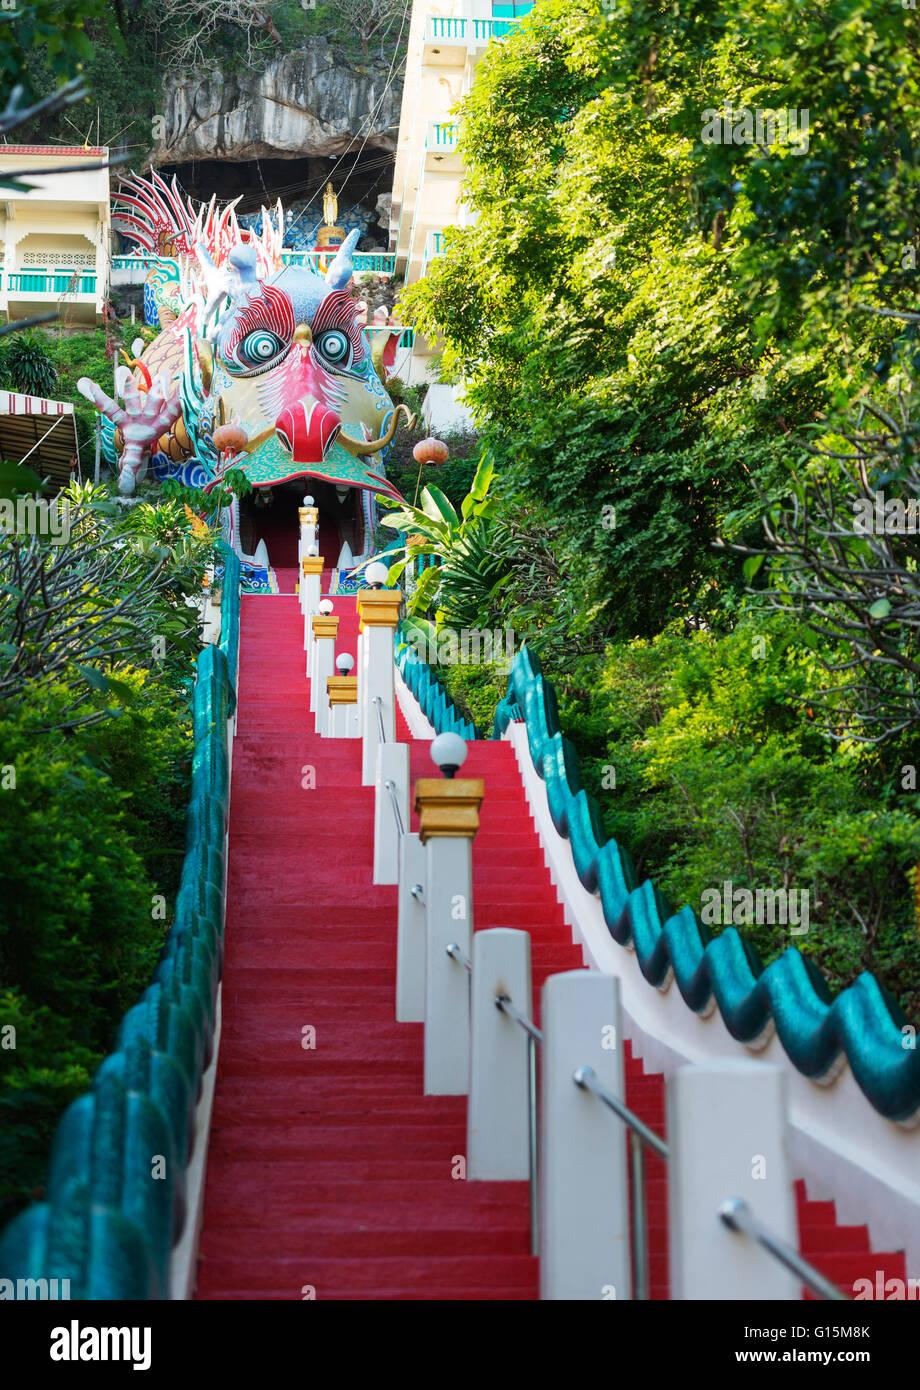 Wat Ban Tham (The Dragon temple), Kanchanaburi, Thailand, Southeast Asia, Asia - Stock Image